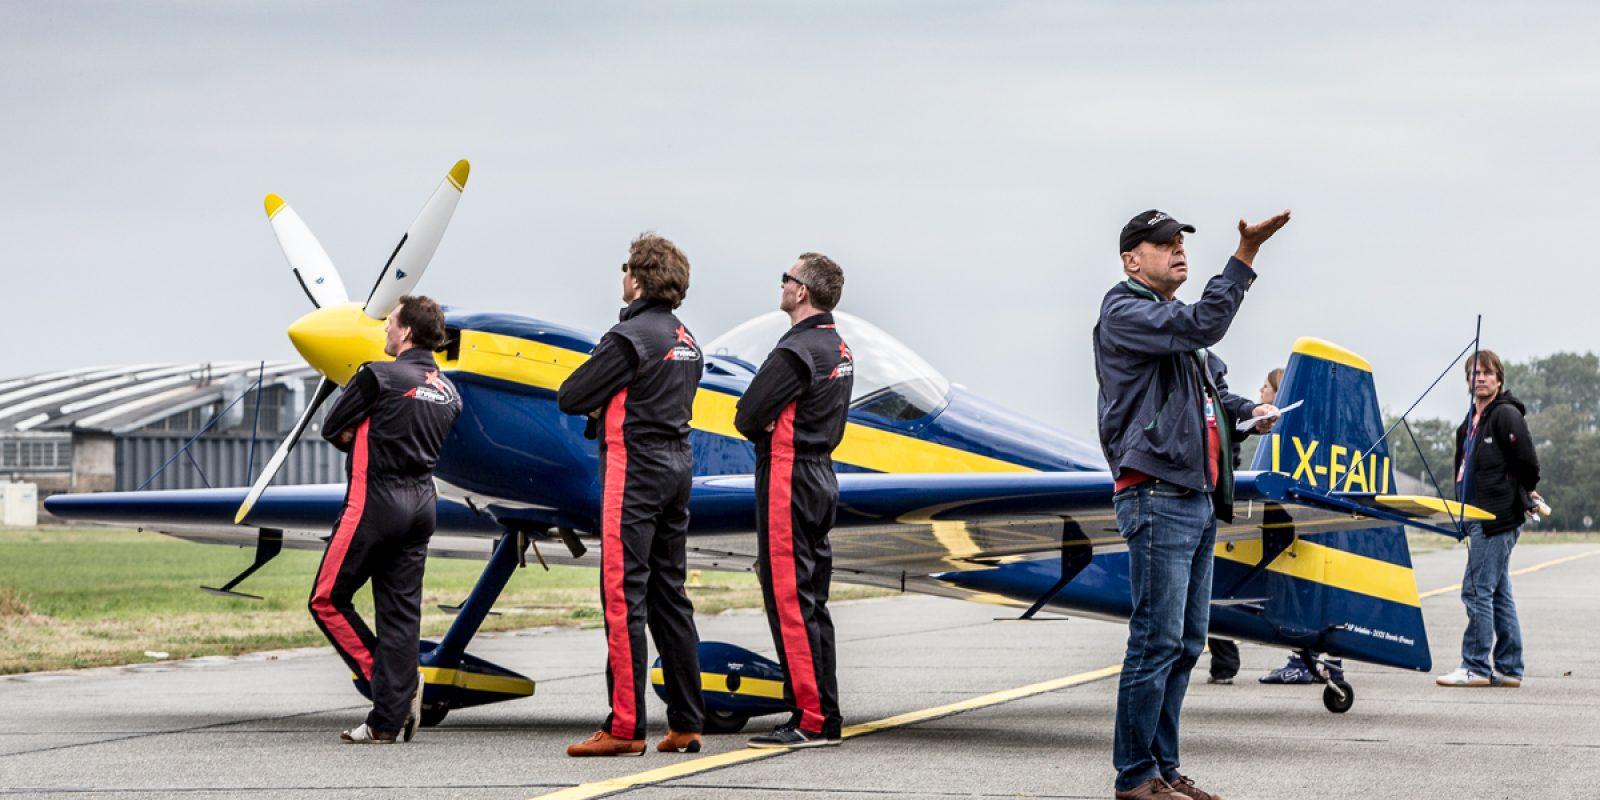 201609_AerobaticsKoksijde05_TBR.jpg